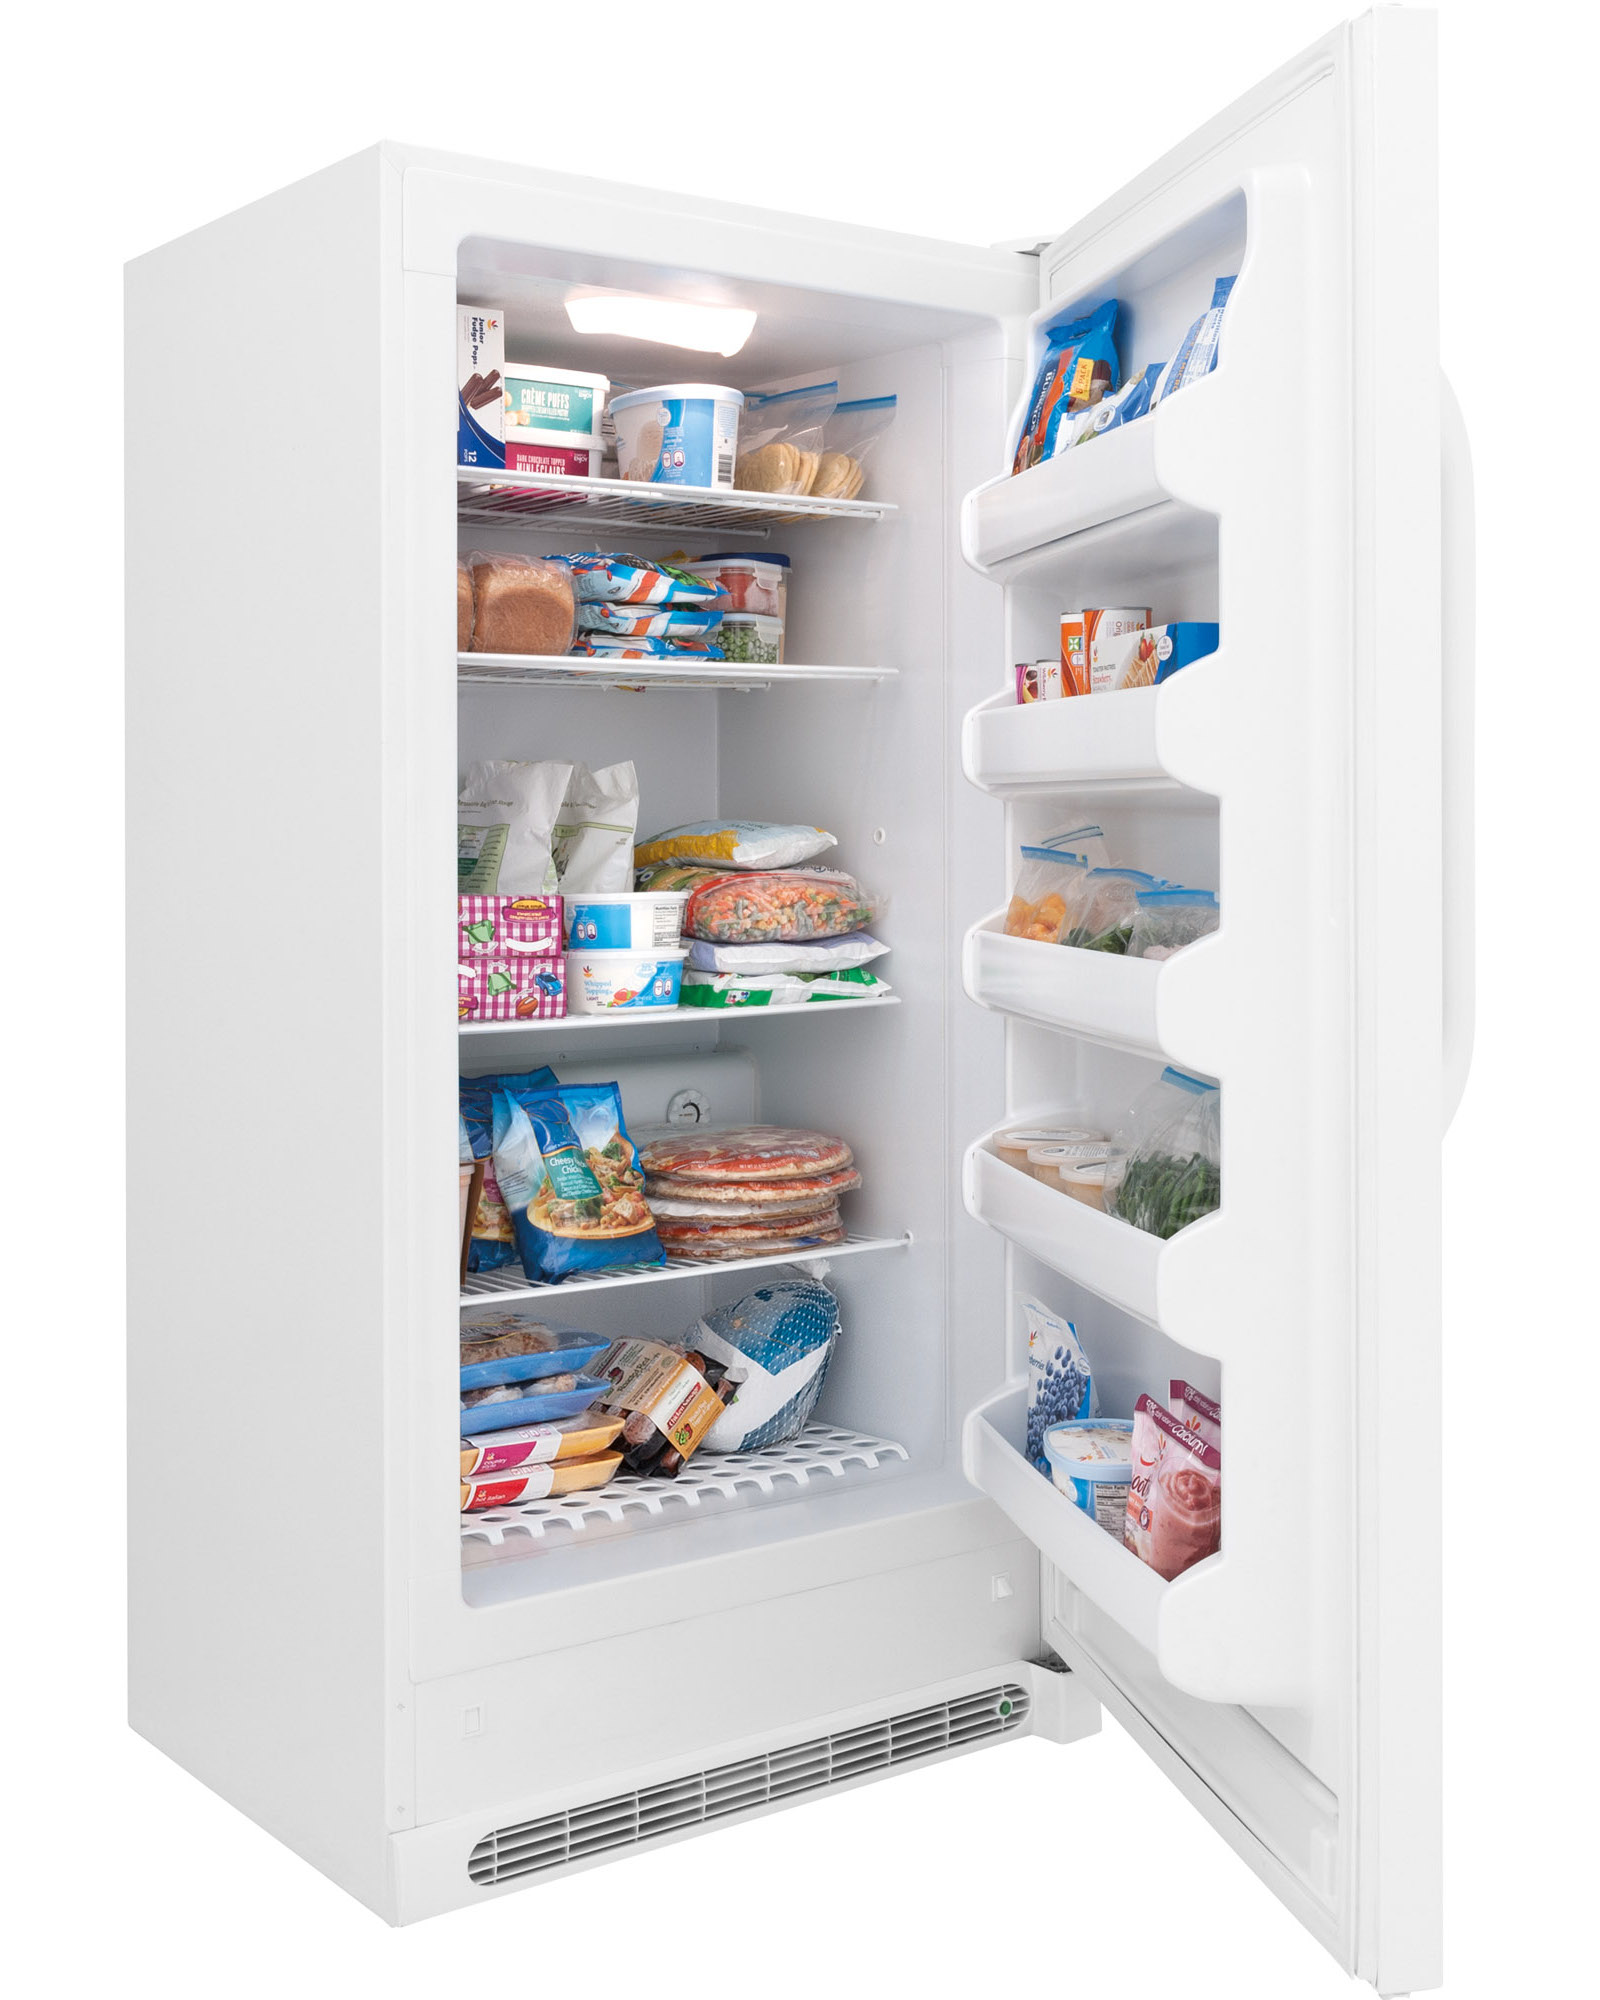 Frigidaire FFFH17F2QW 16.6 cu. ft. Upright Freezer - White